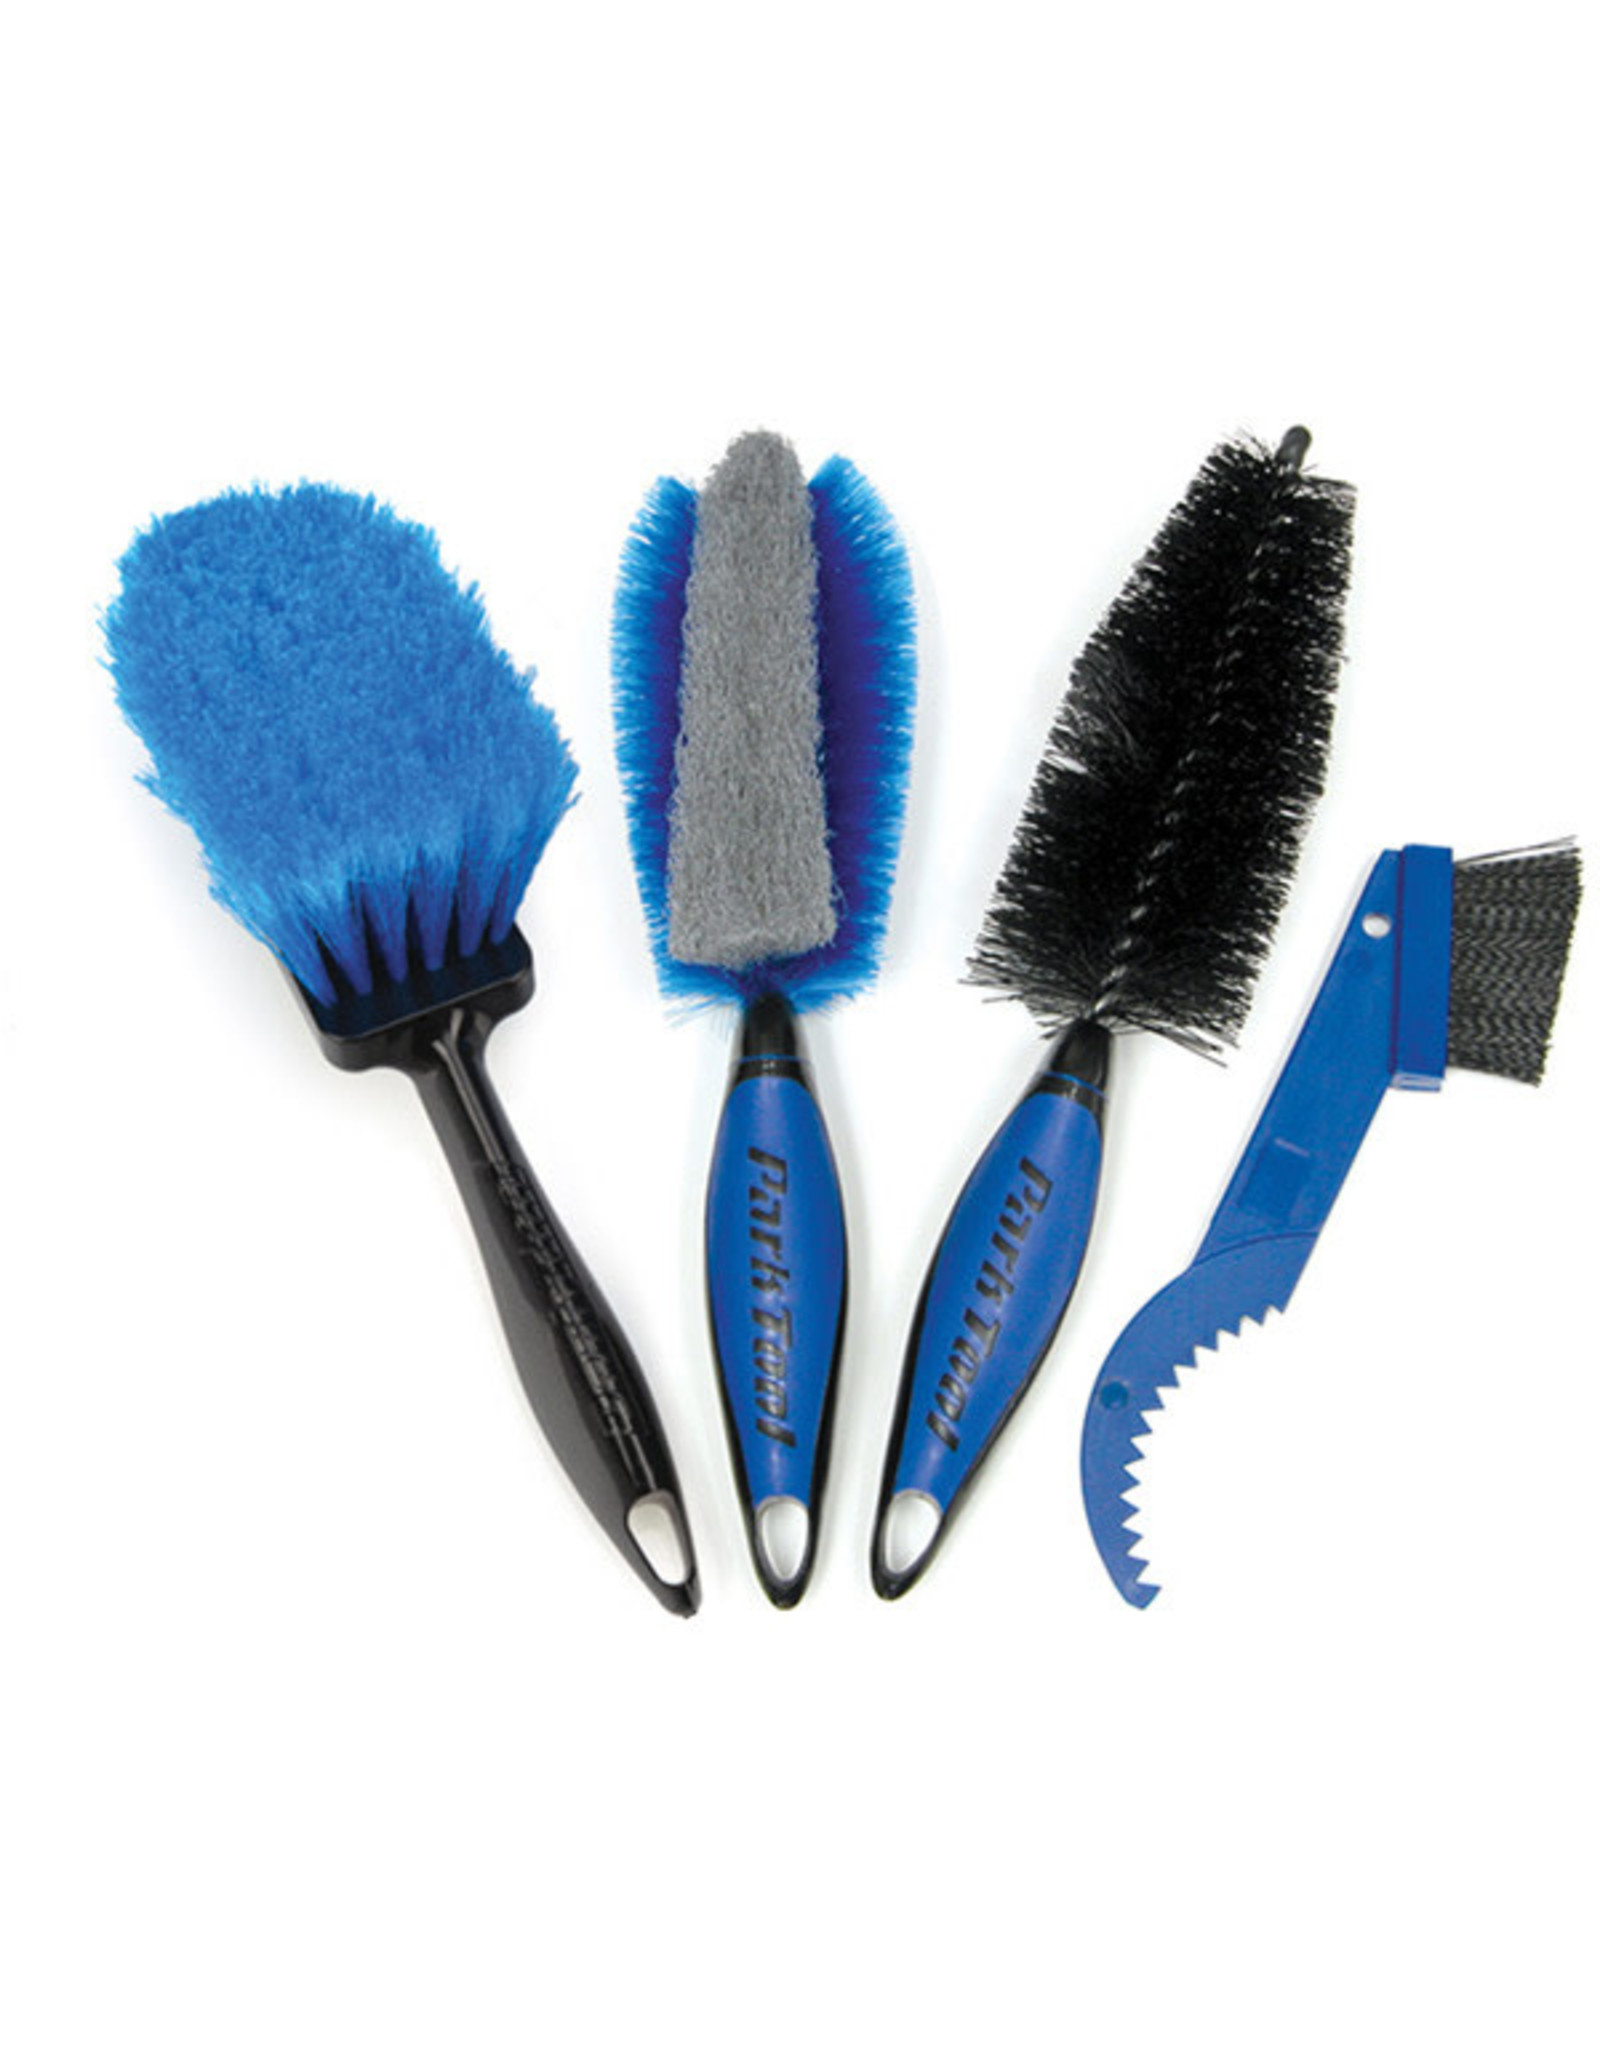 Park Tool BCB-4.2 - Bike Cleaning Brush Set Blue / Black